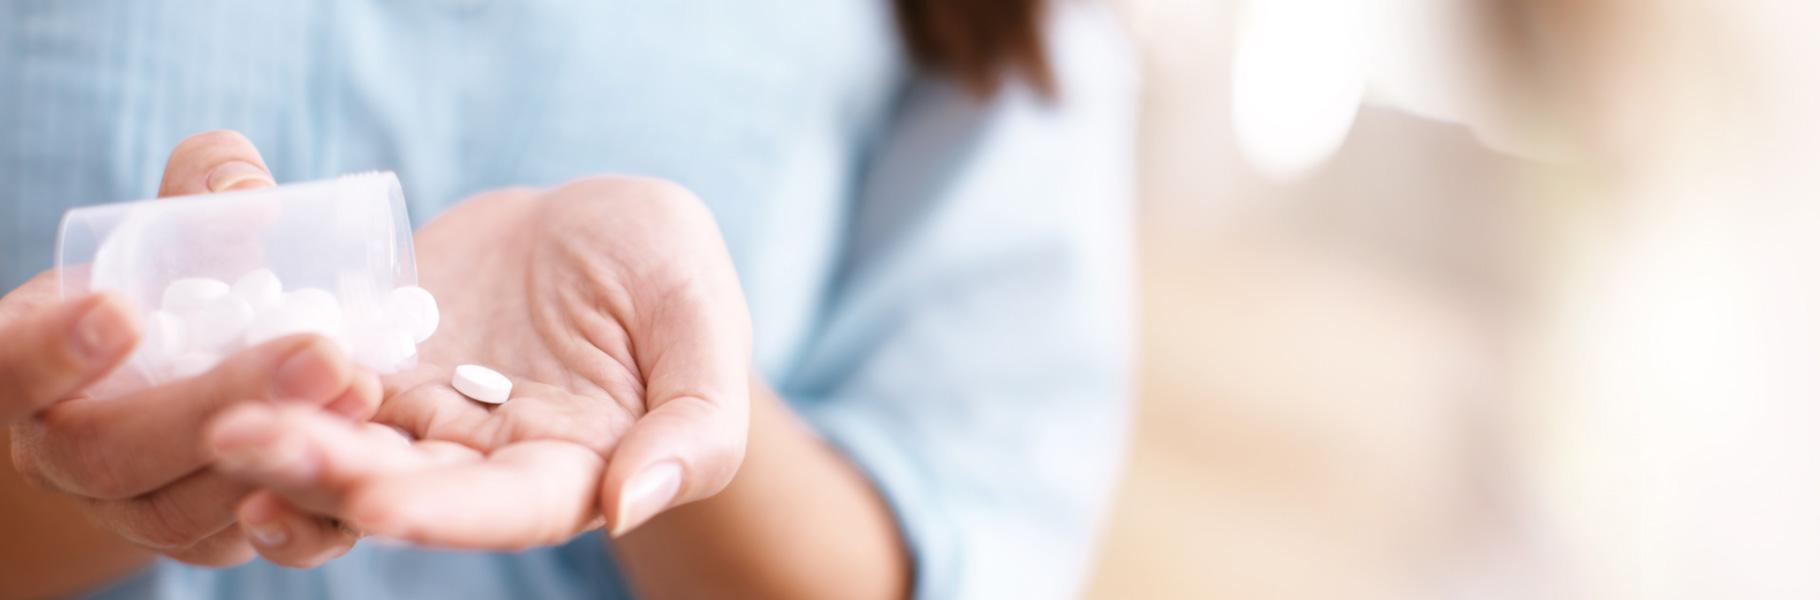 BMI/CTO Team Exceeds Enrollment Goal for Aspirin Study